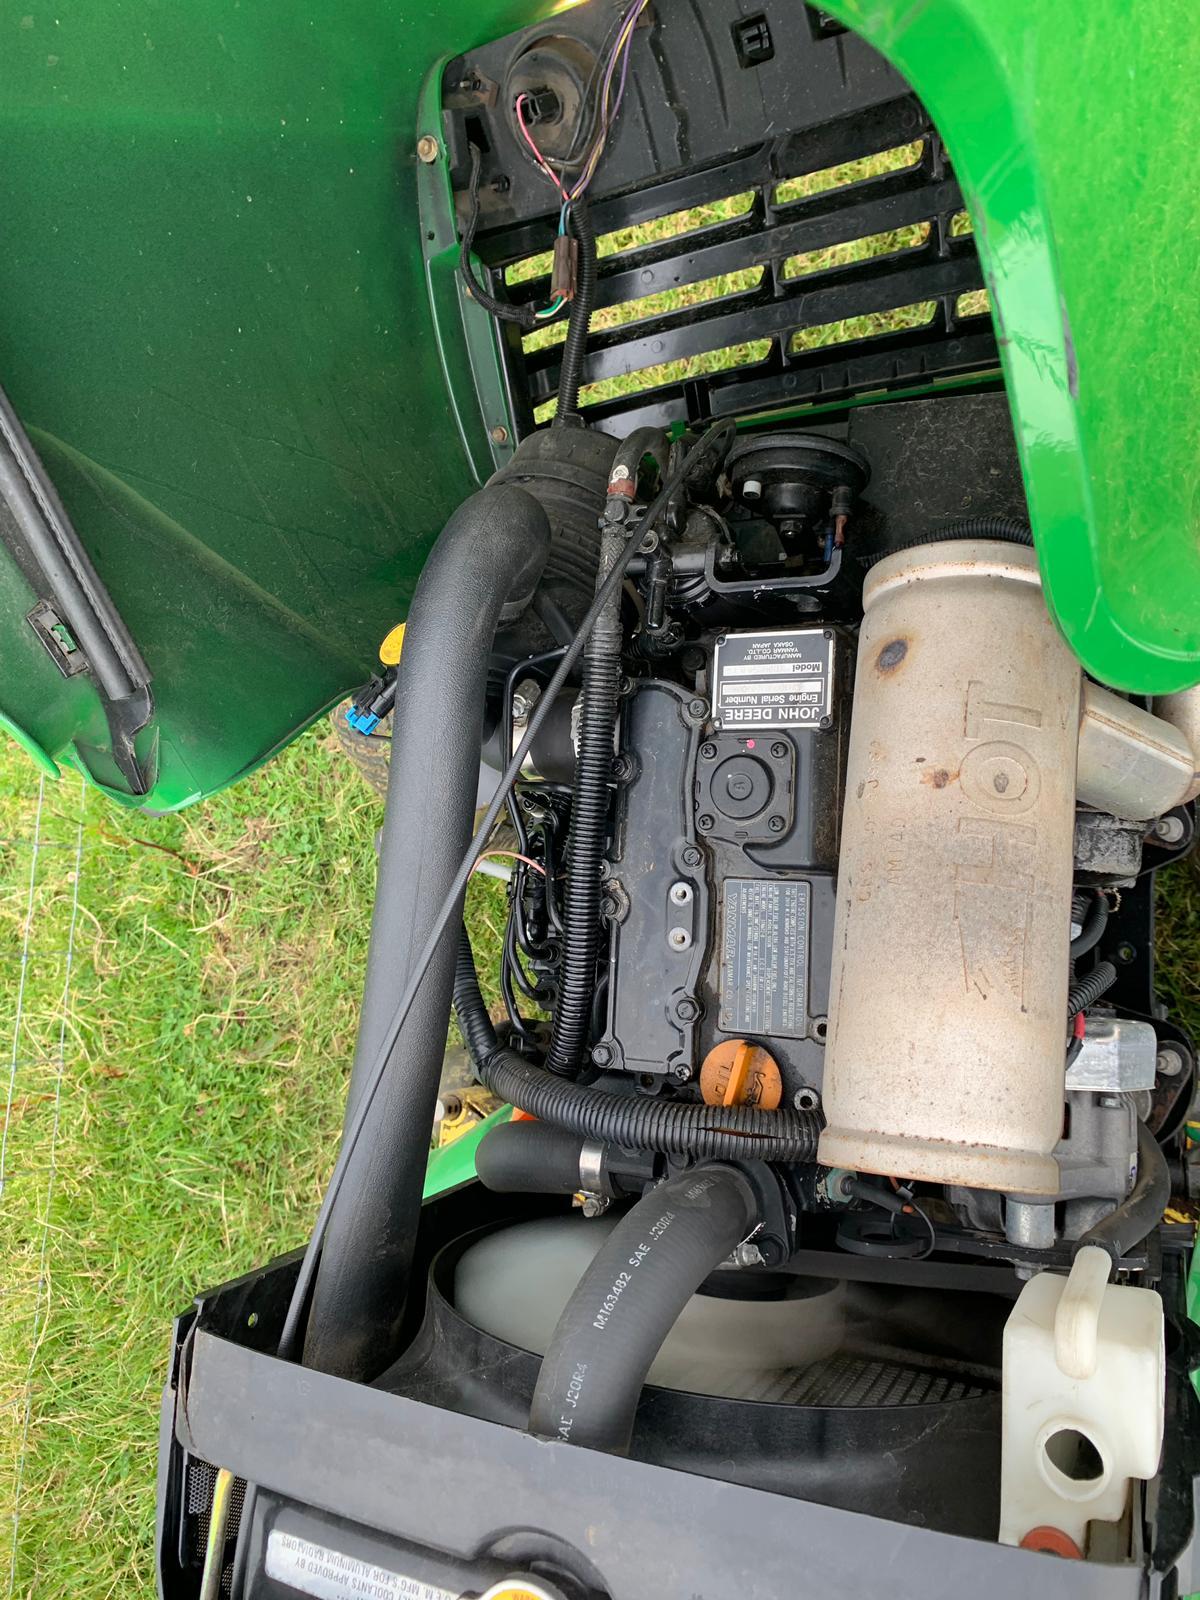 Lot 66 - 2011/11 REG JOHN DEERE X749 ULTIMATE 4X4 WHEEL STEER RIDE ON LAWN MOWER *PLUS VAT*